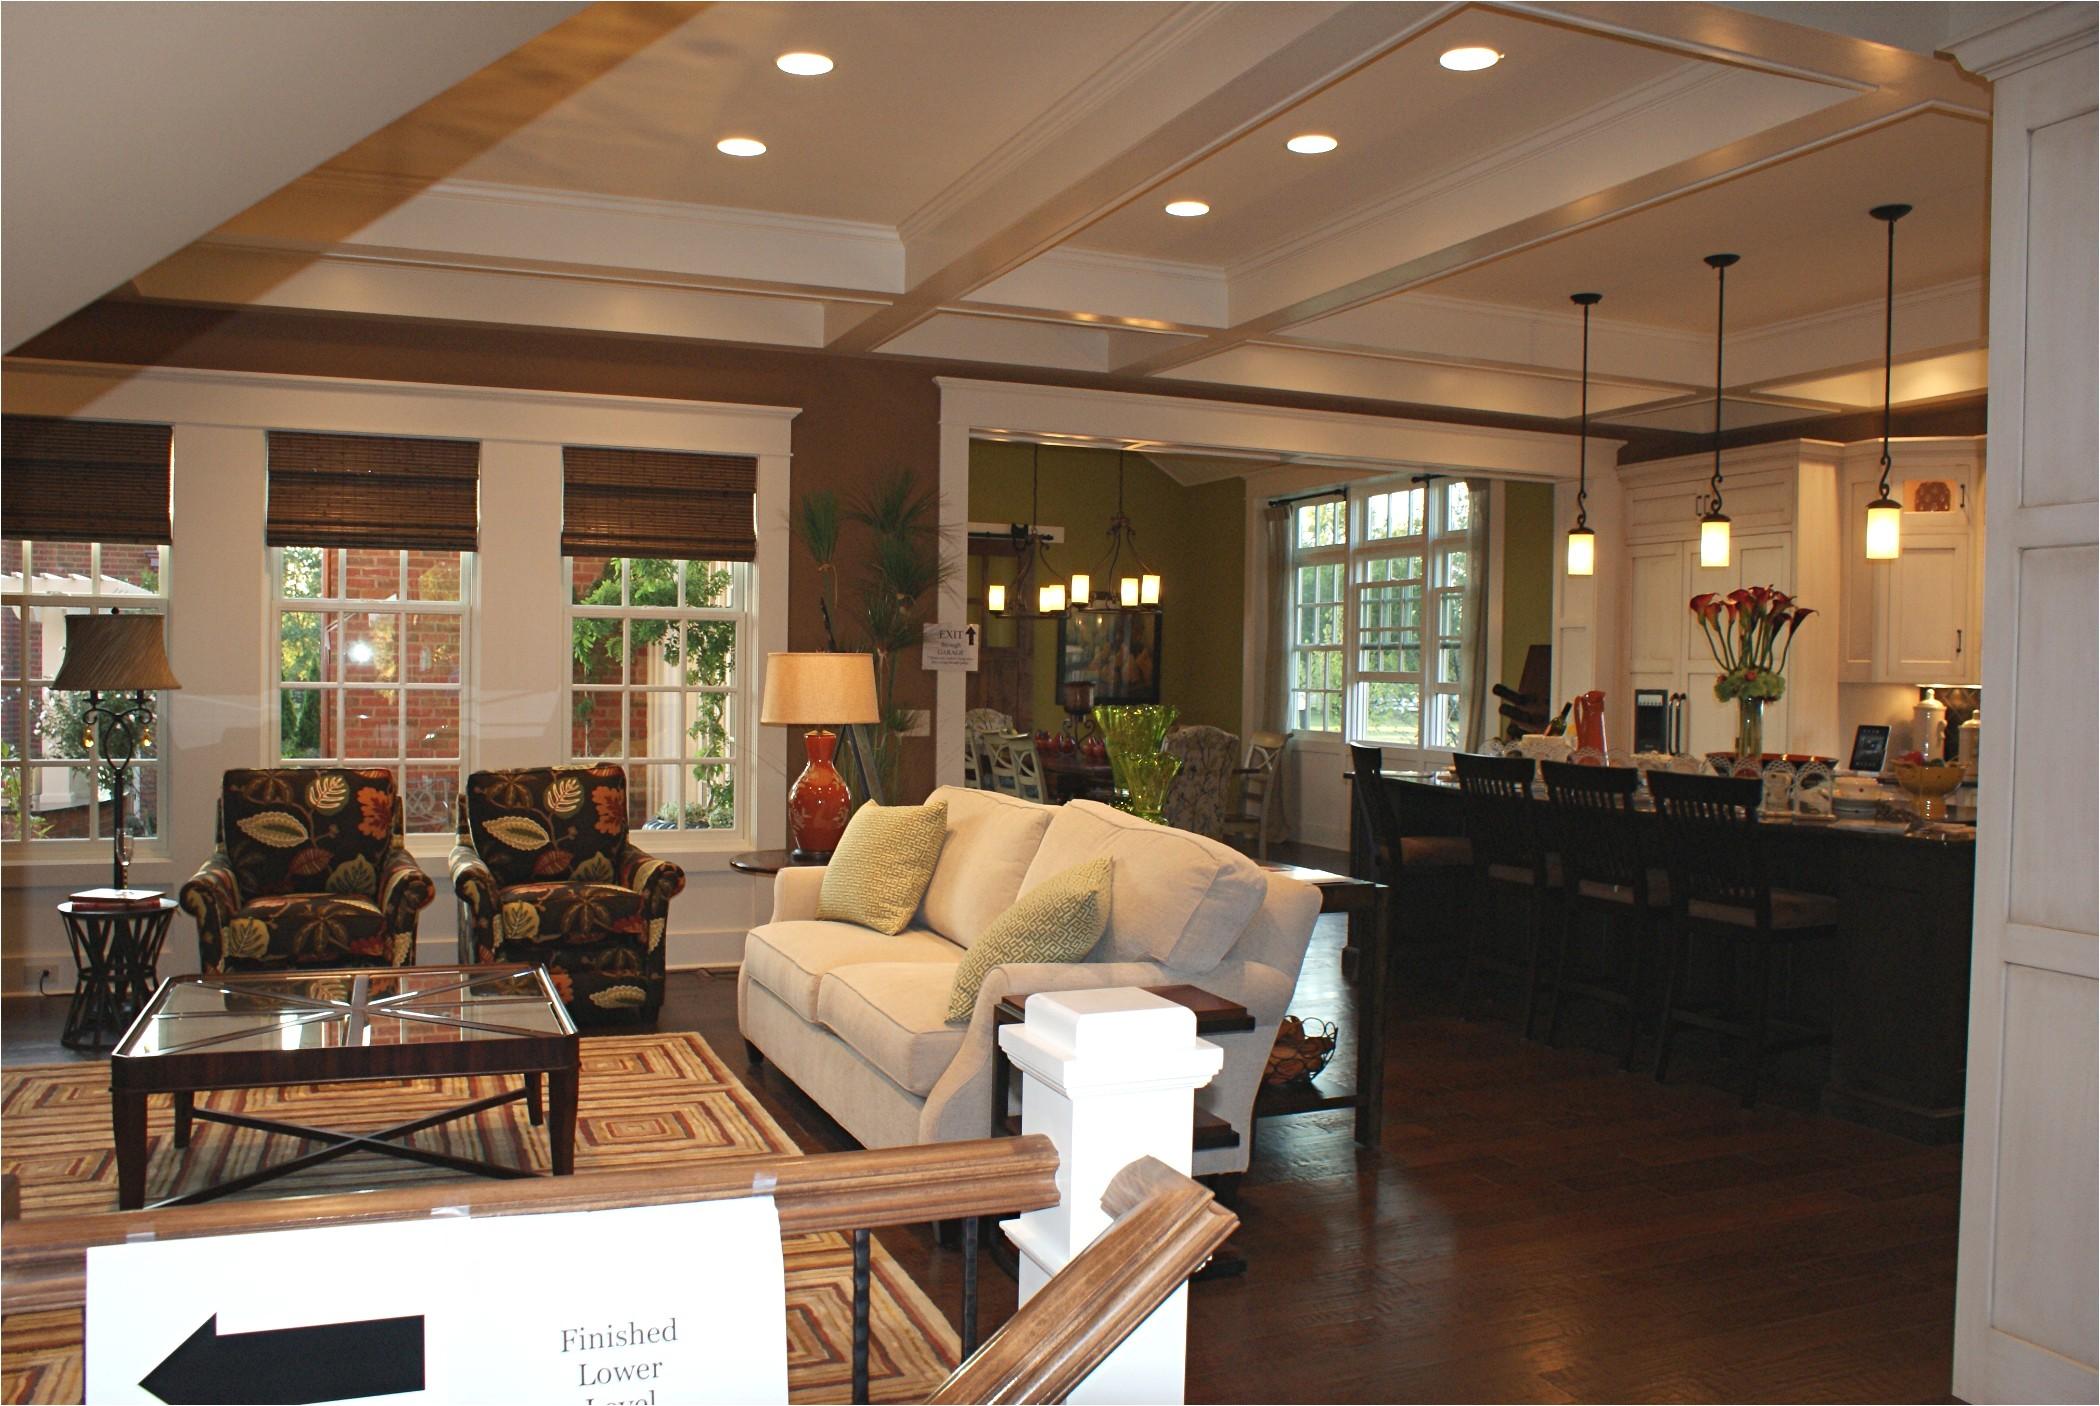 enjoyable open floor plan for home design ideas with open concept floor plans